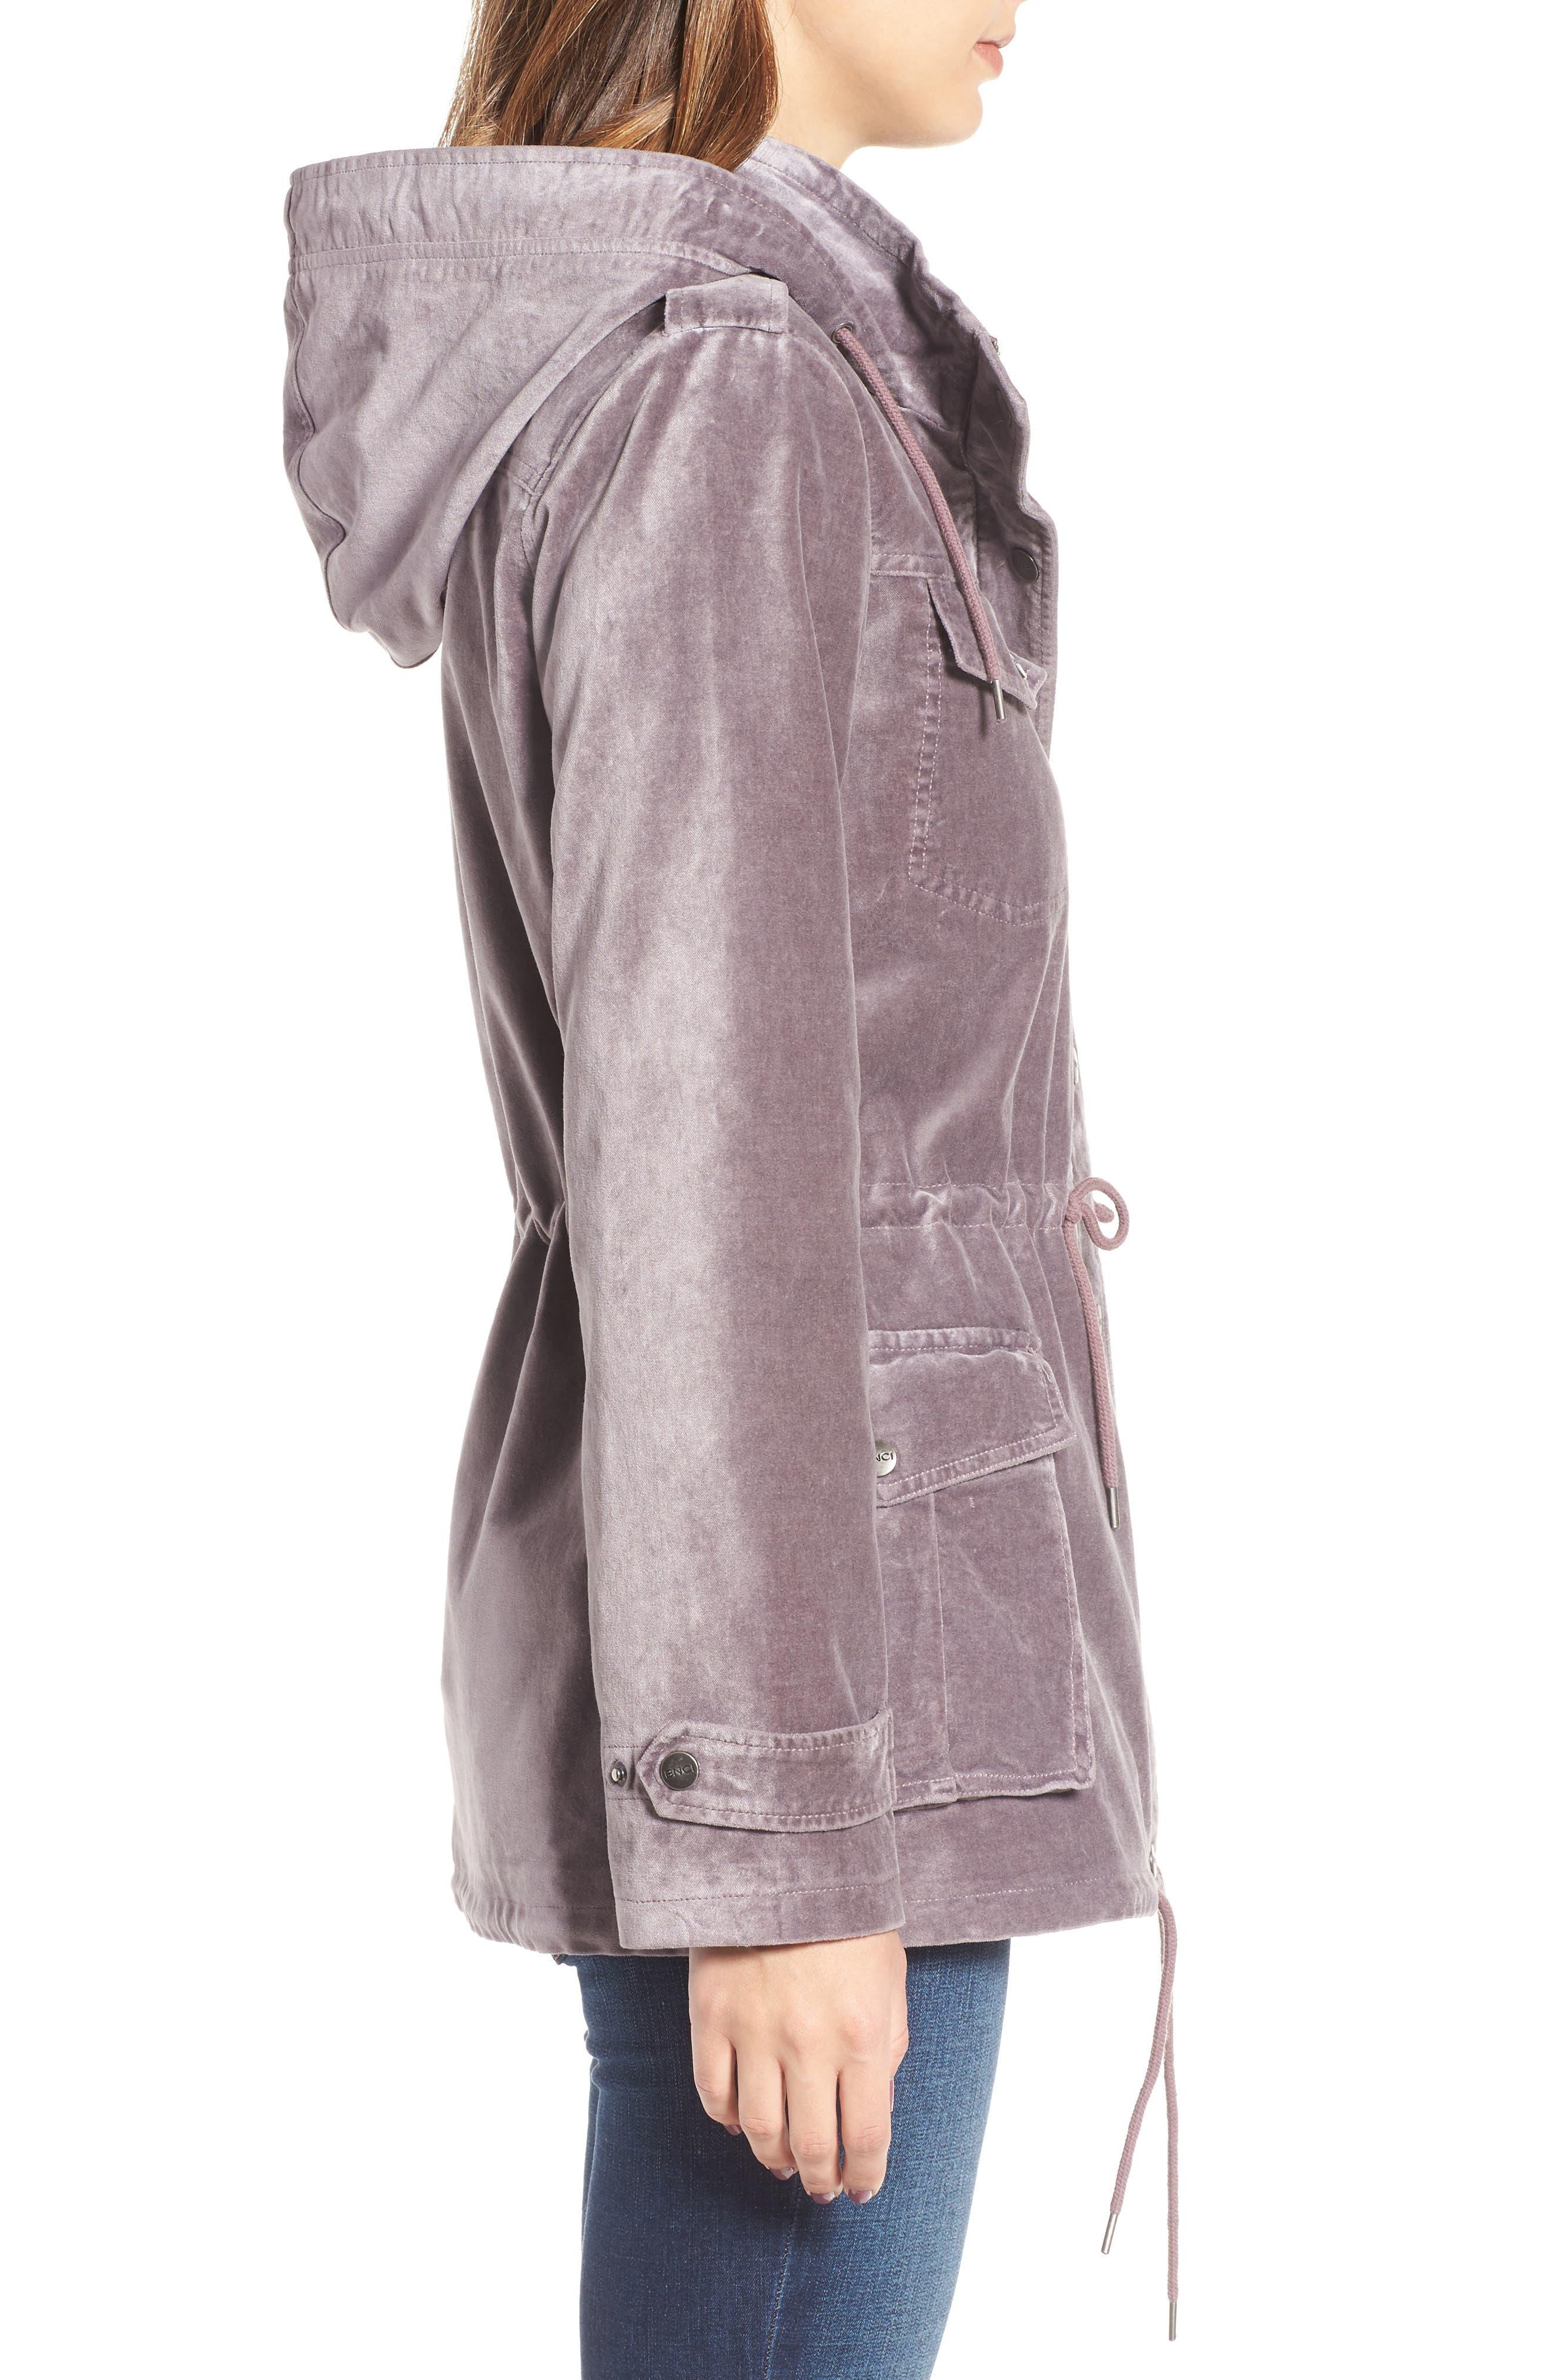 BNCI Cotton Velveteen Hooded Anorak Jacket,                             Alternate thumbnail 6, color,